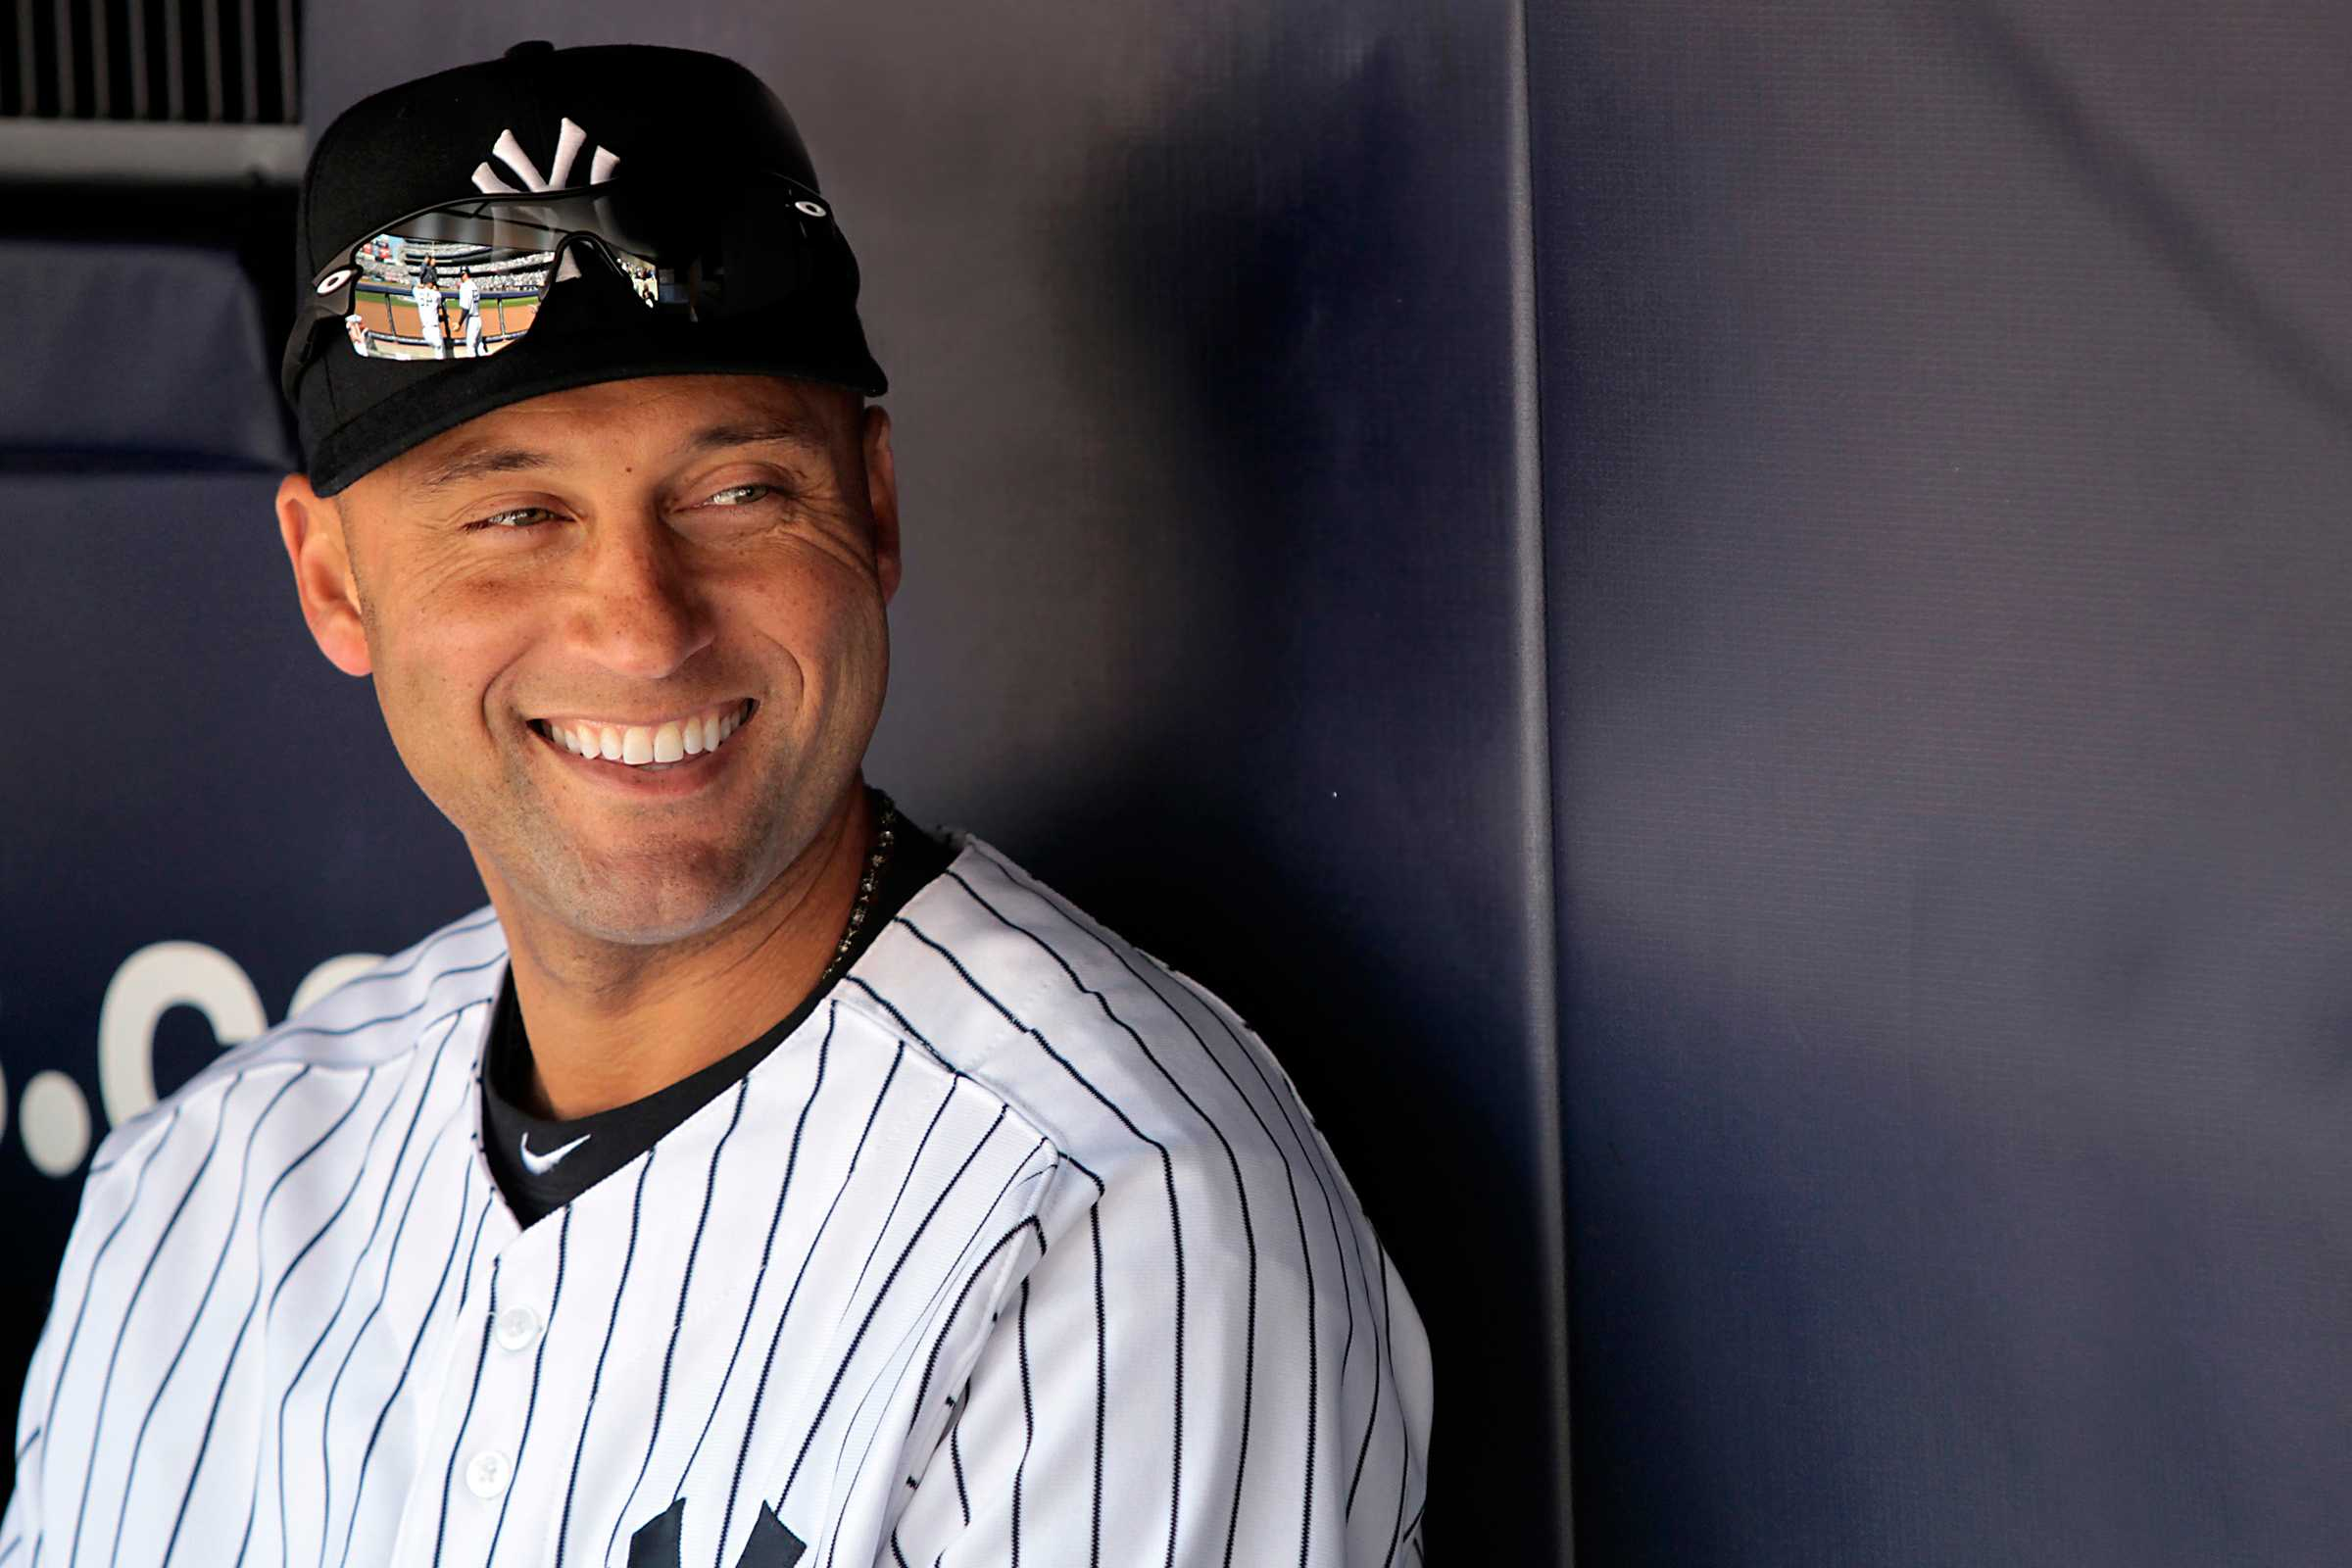 Curtain Call: The Baseball World Embraces Derek Jeteru0027s Final Game At  Yankee Stadium